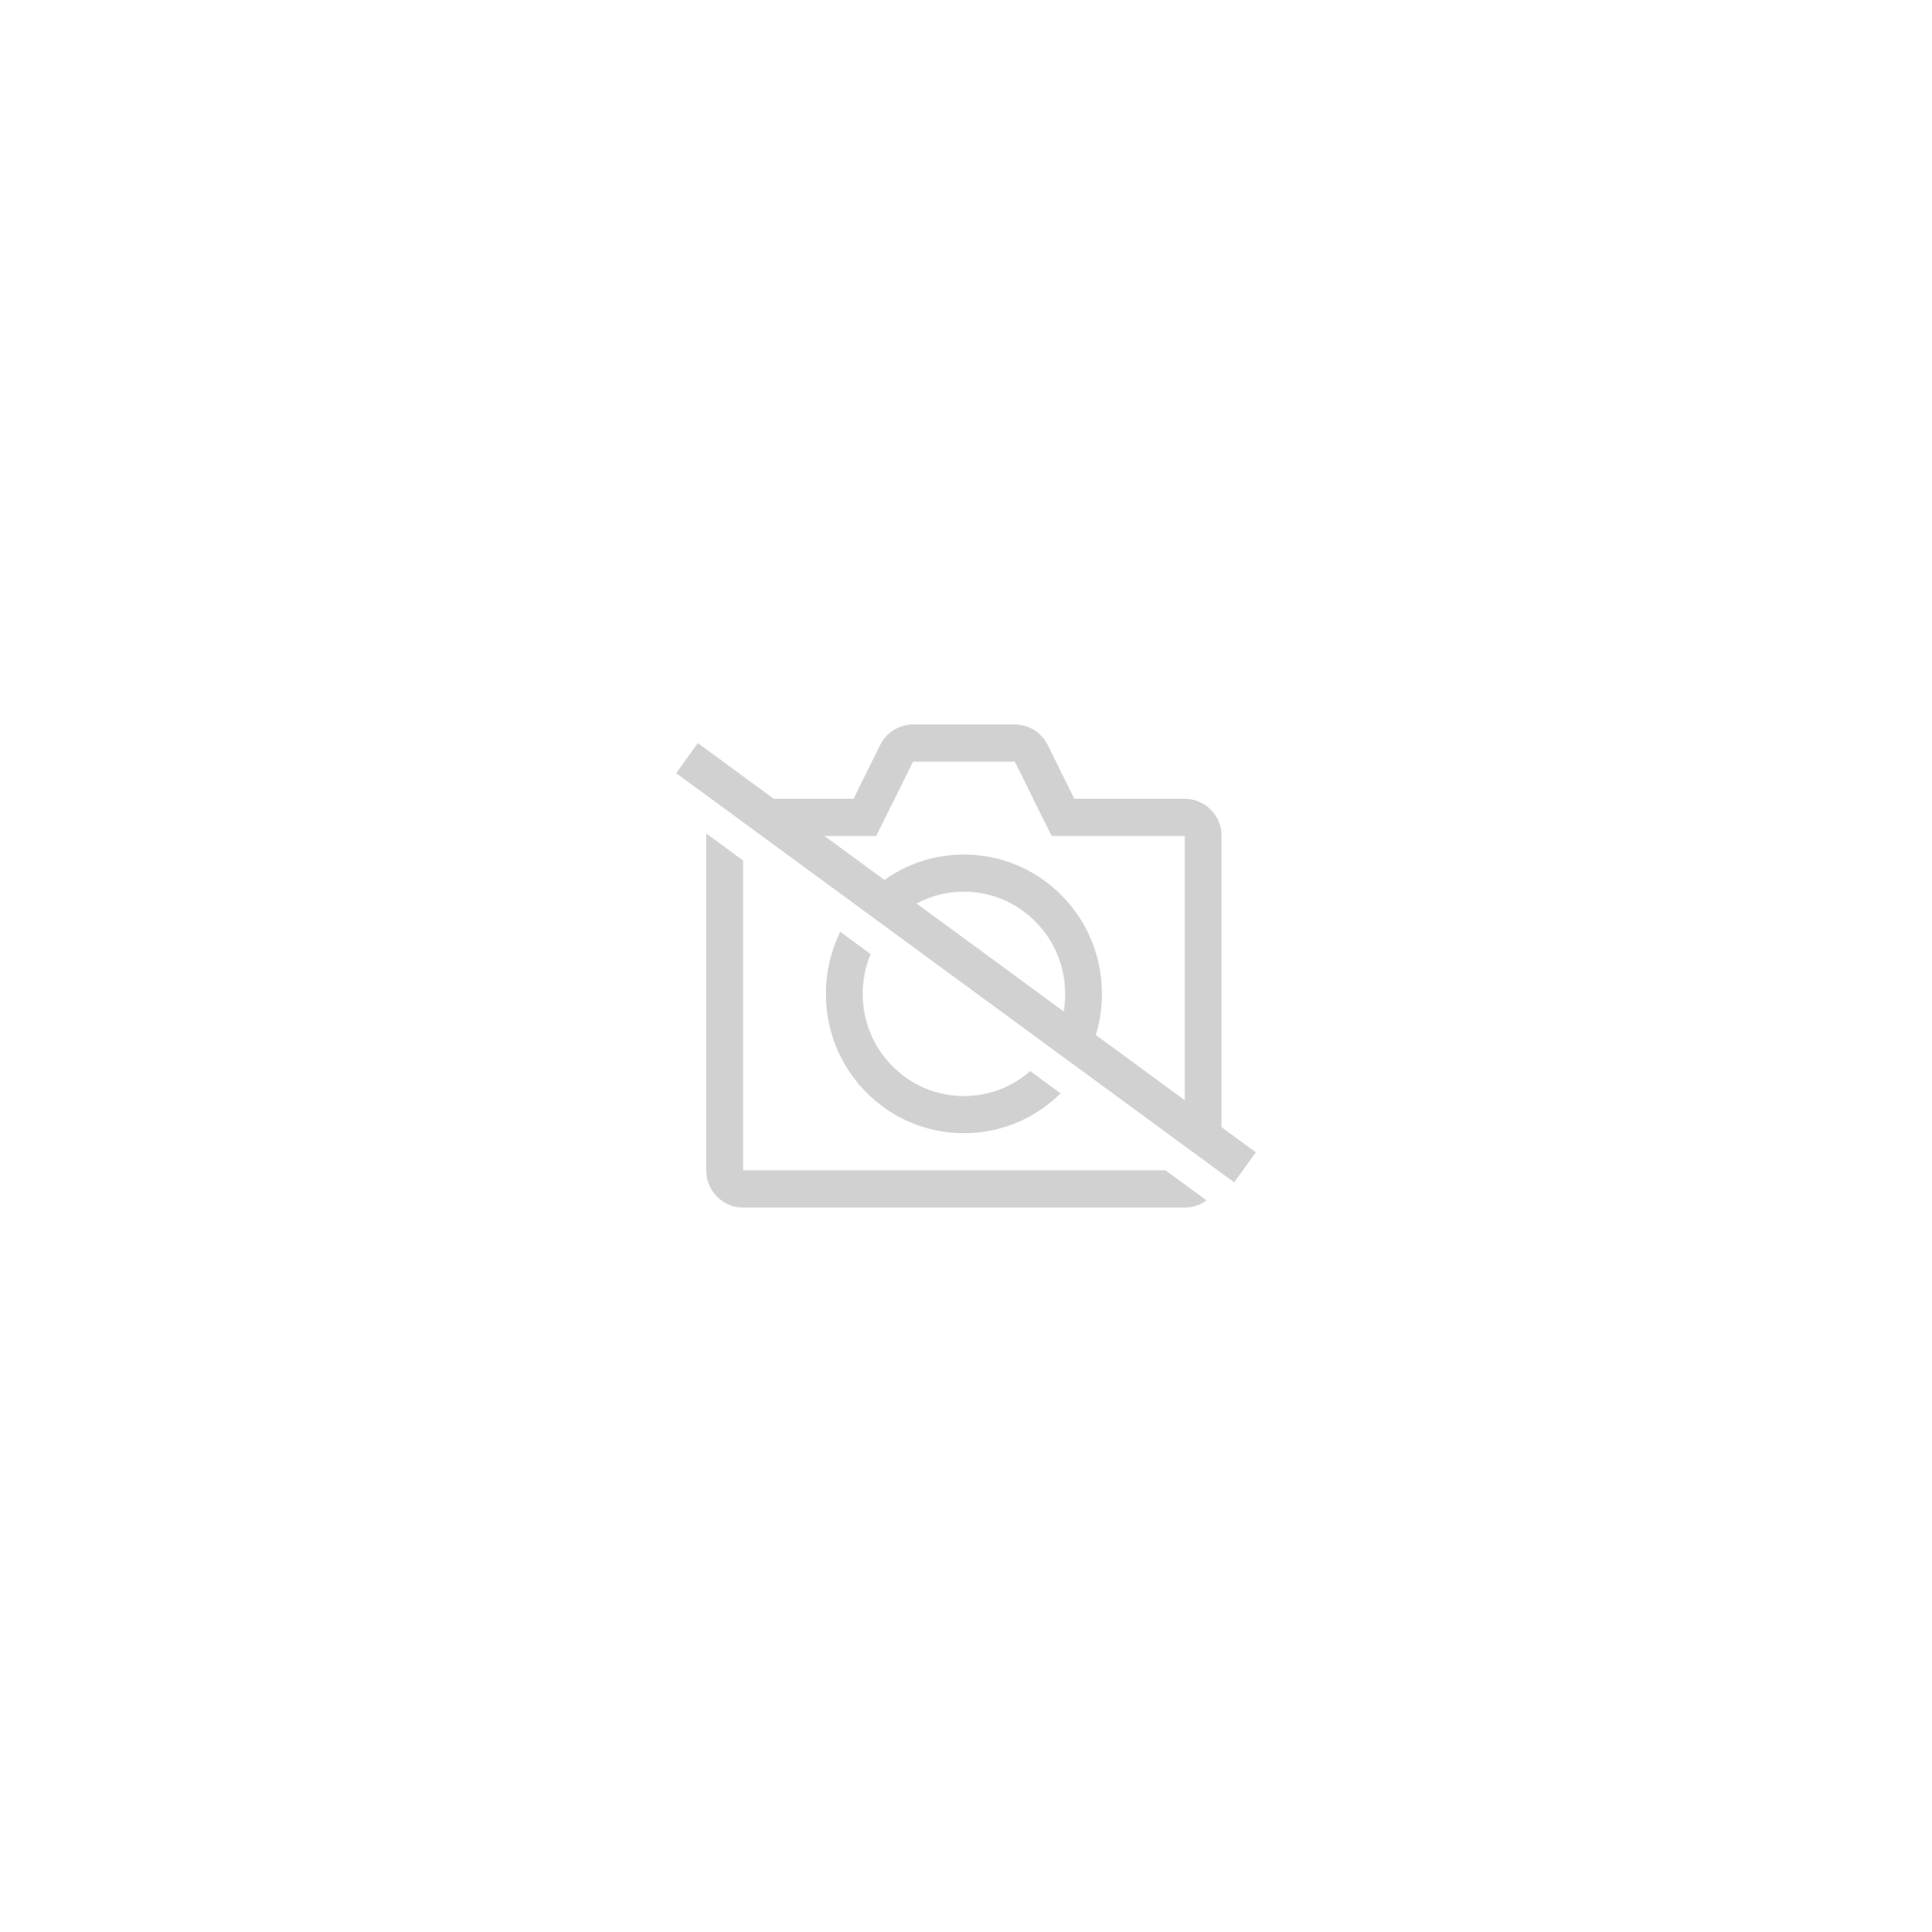 Chariot à bûches en osier blanc